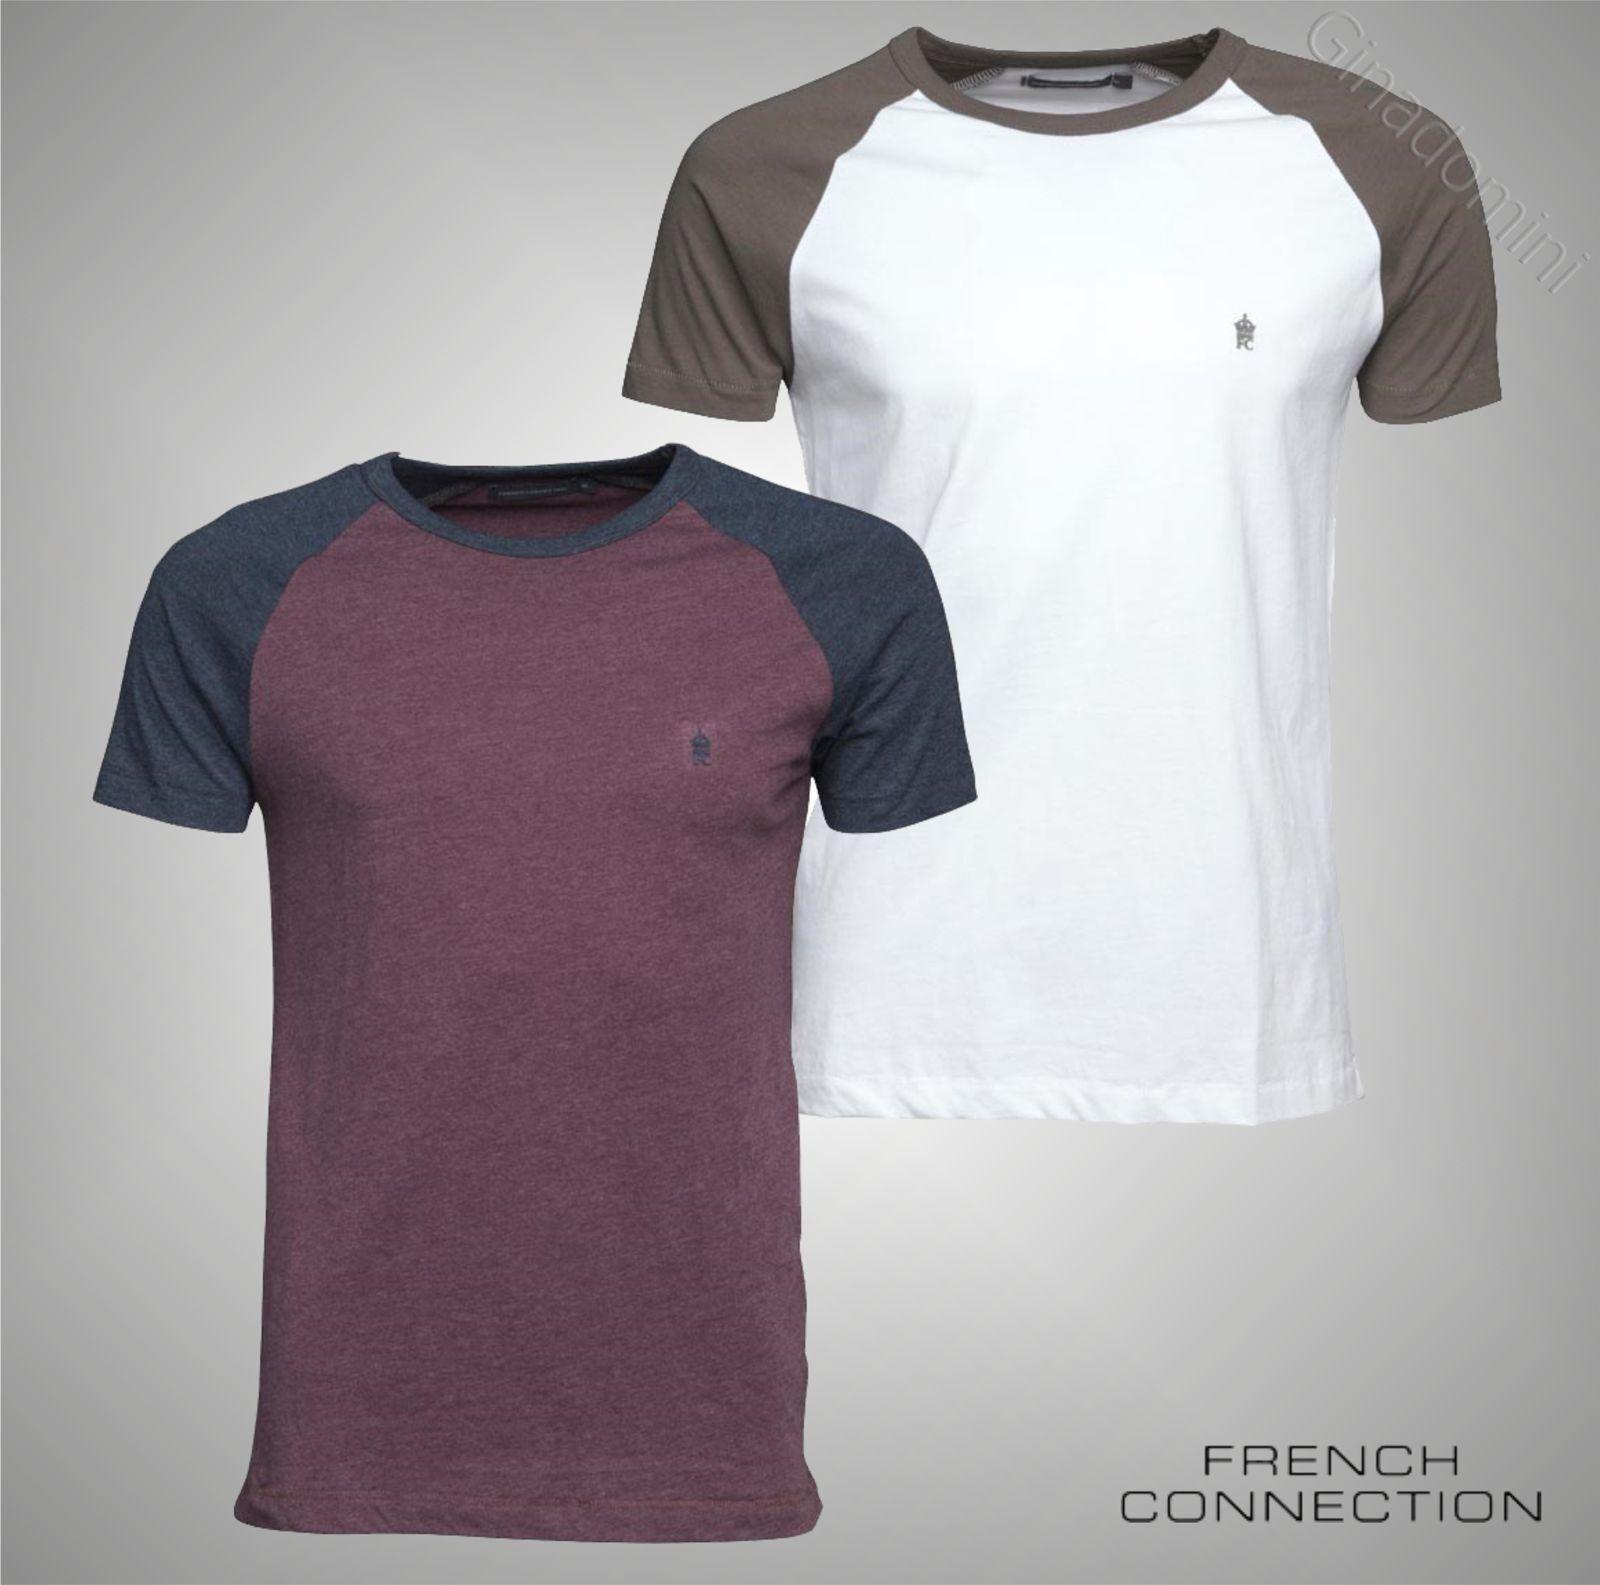 xxl Connection S De Marque Courte Taille T French Raglan Manches Shirt Homme BPnqxHR7B